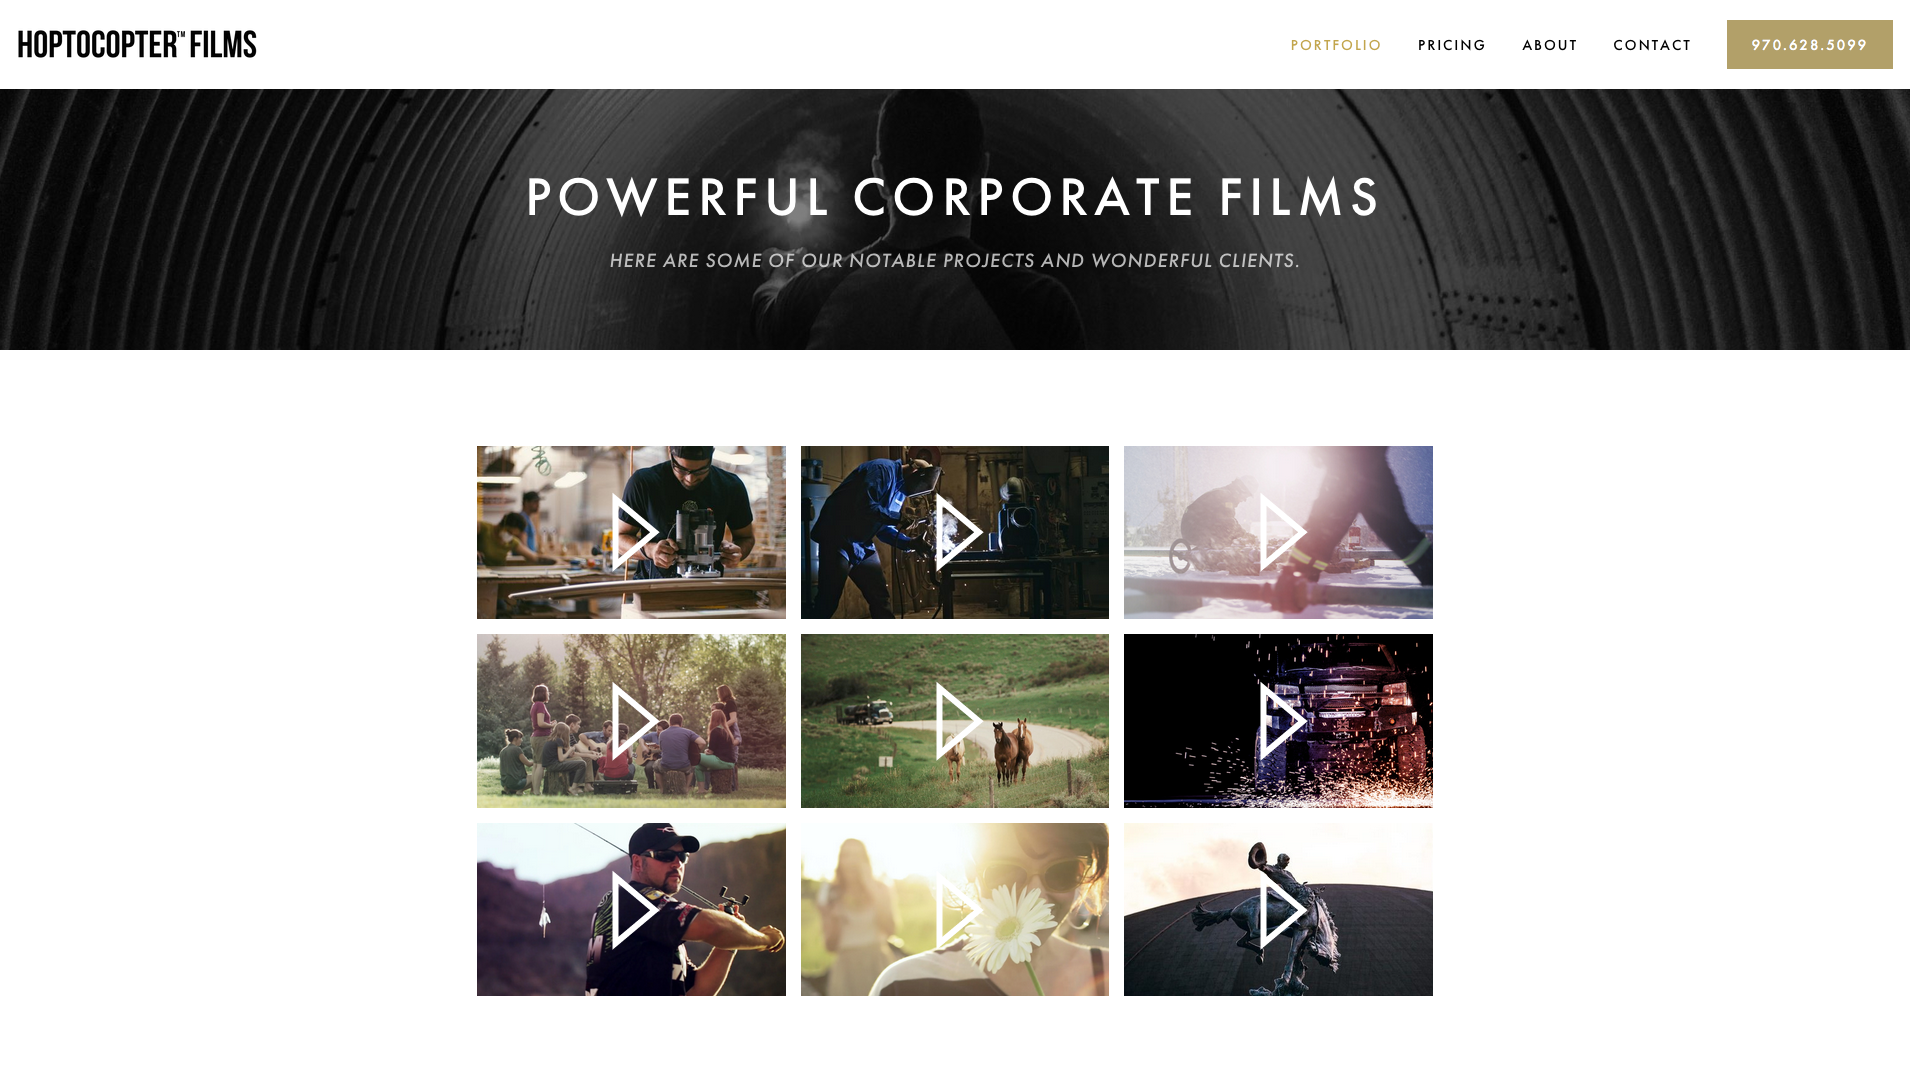 Hoptocopter_Films.png